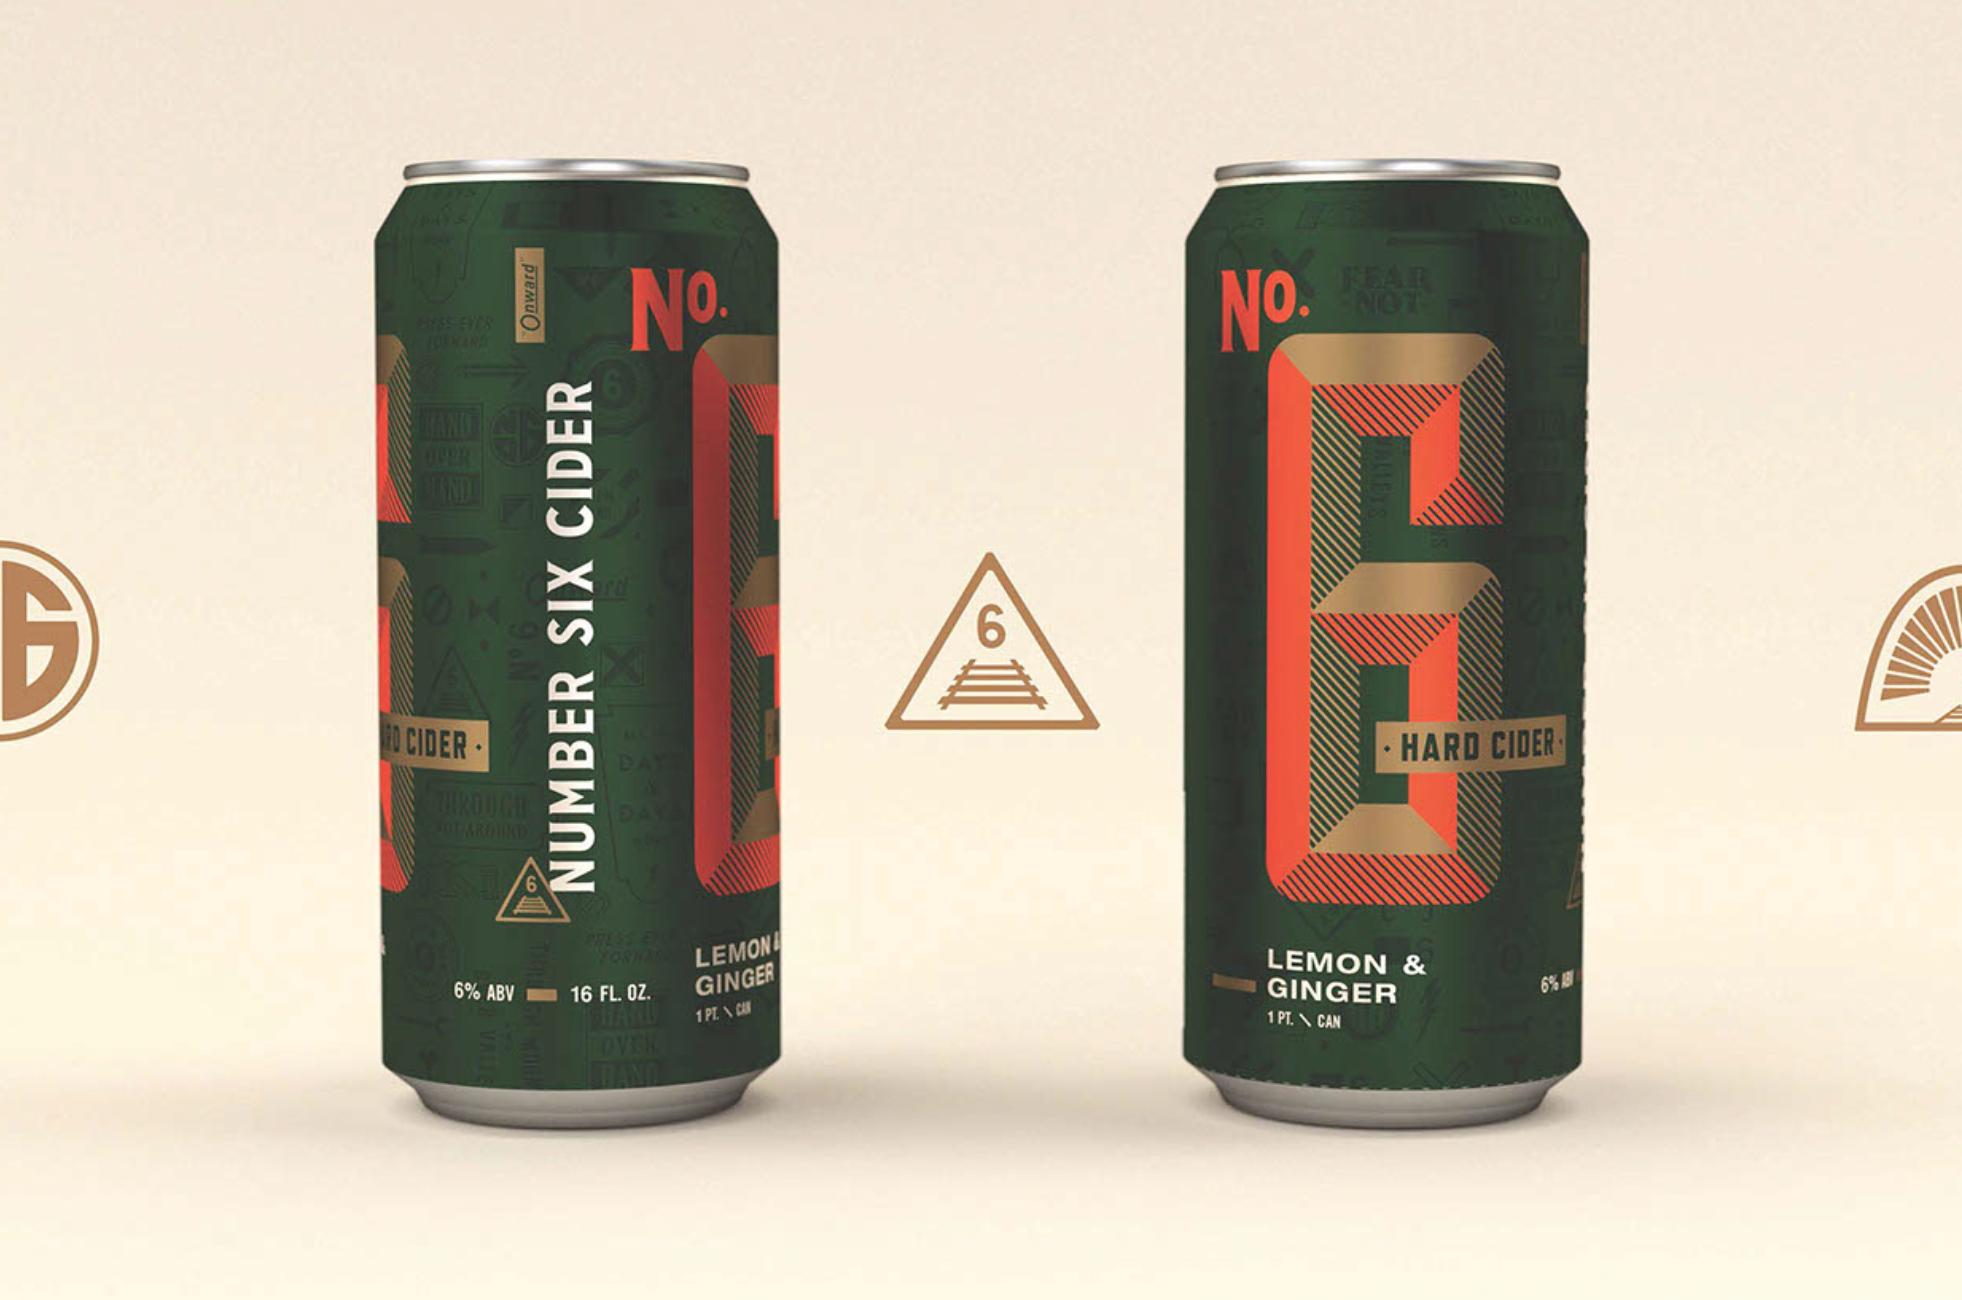 Cider & Branding:No. 6 Cider